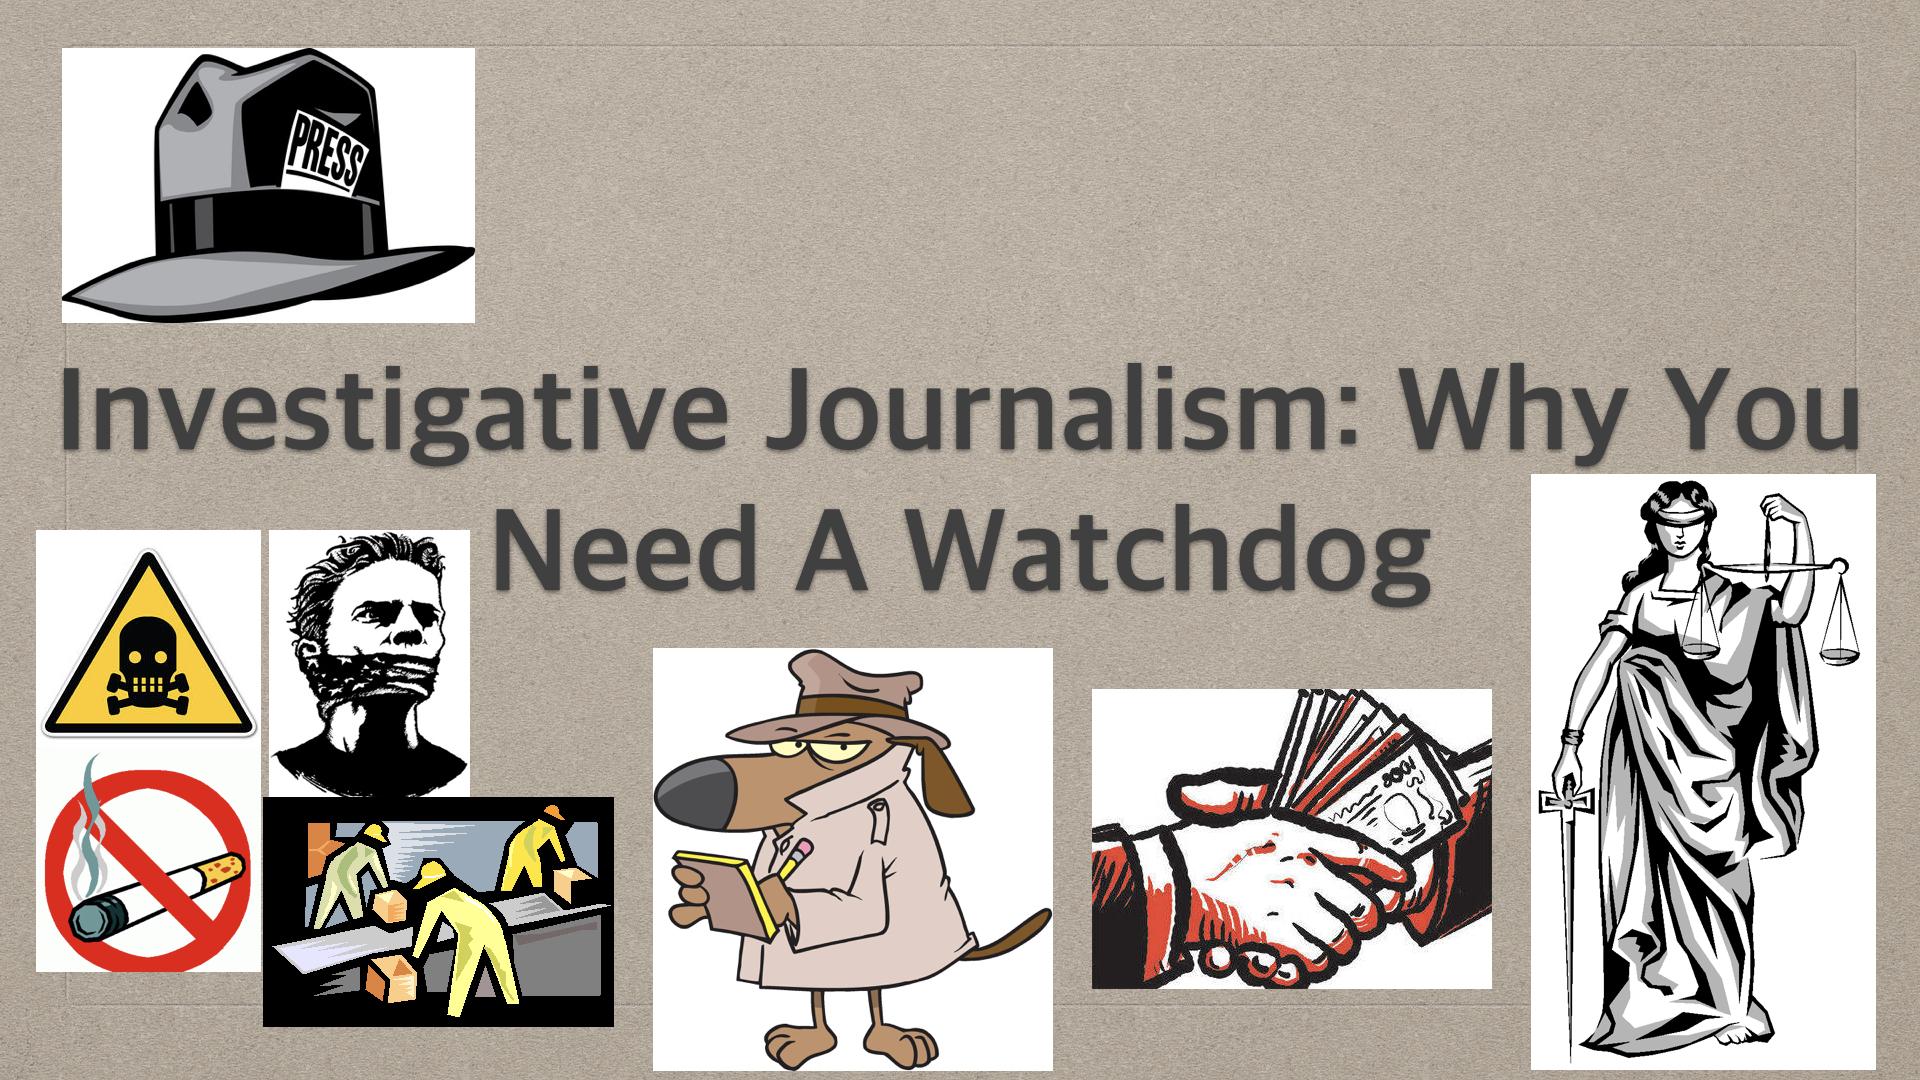 Write Hard To Live Free: Happy Year Of The (Watch)Dog! 番犬報道の年ですよ!謹賀新年